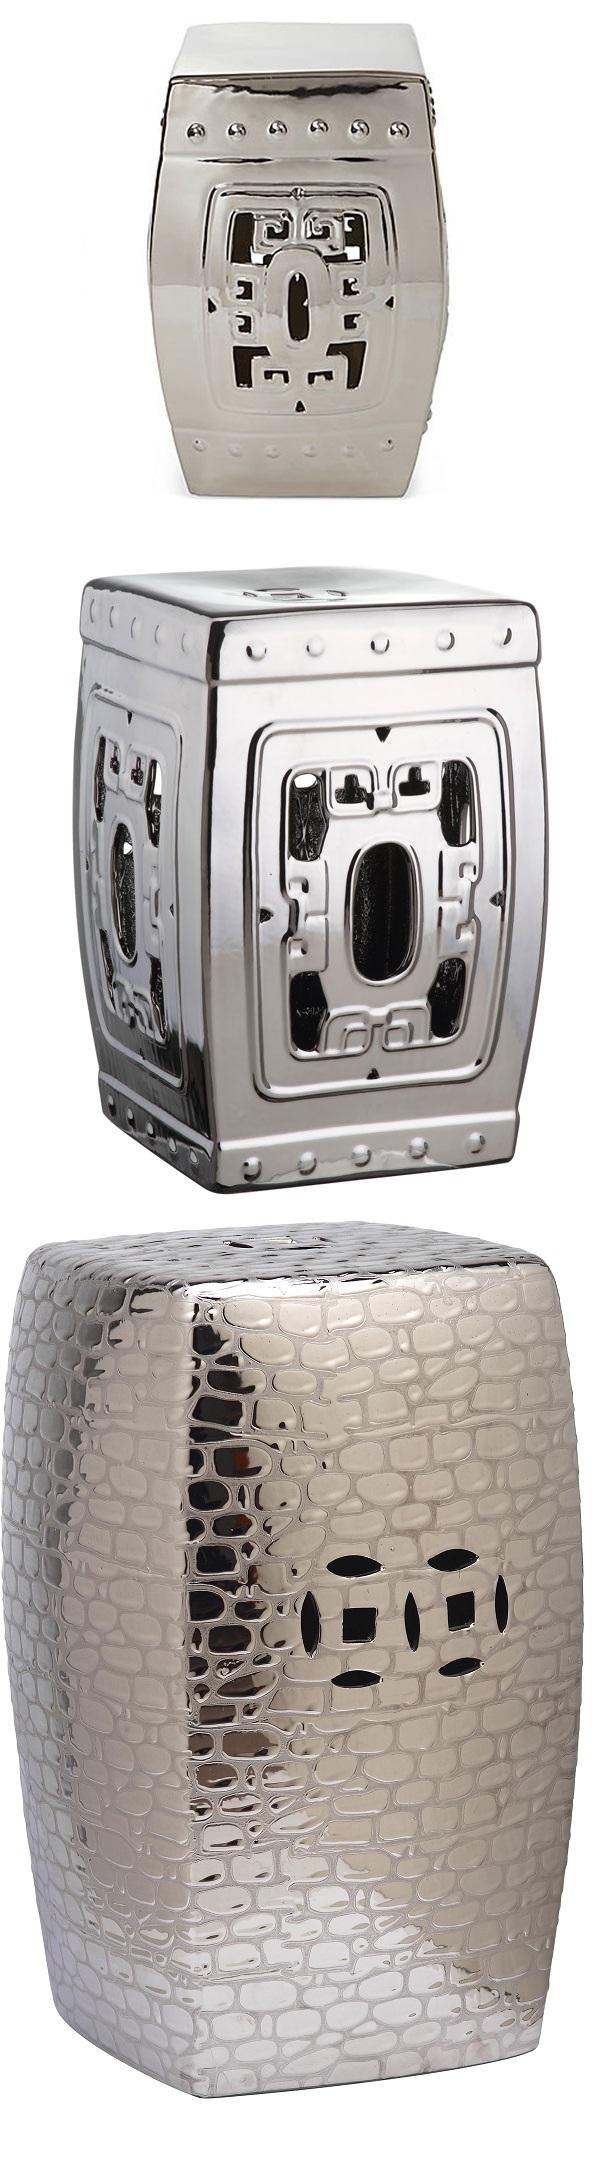 Silver Garden Stool | Silver Ceramic Stools | Silver Porcelain Stool | Silver Ceramic Stool |  sc 1 st  Pinterest & Silver Garden Stool | Silver Ceramic Stools | Silver Porcelain ... islam-shia.org